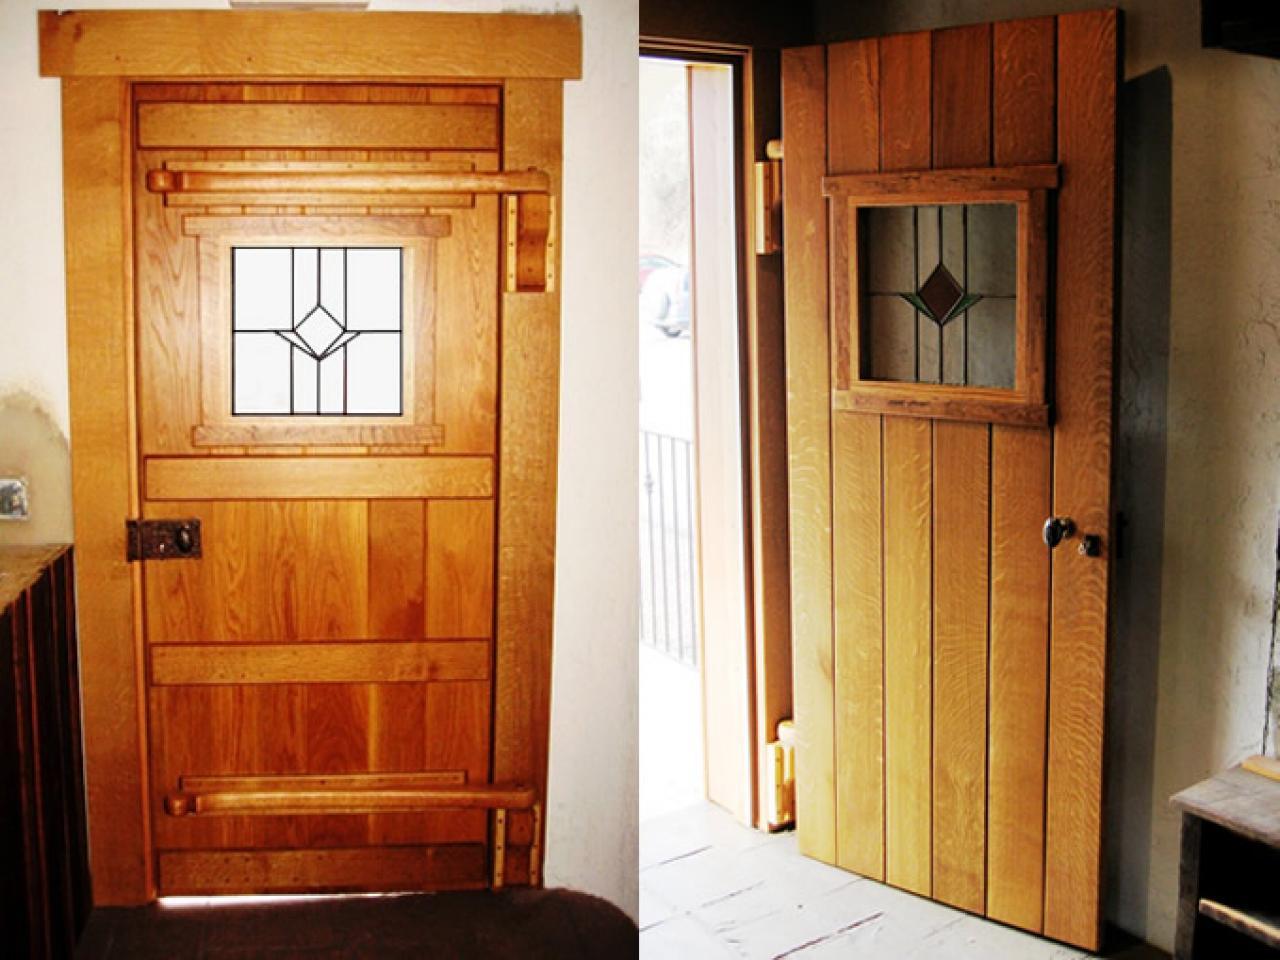 blog cabin 2009 shingles veneer doors and more voting. Black Bedroom Furniture Sets. Home Design Ideas